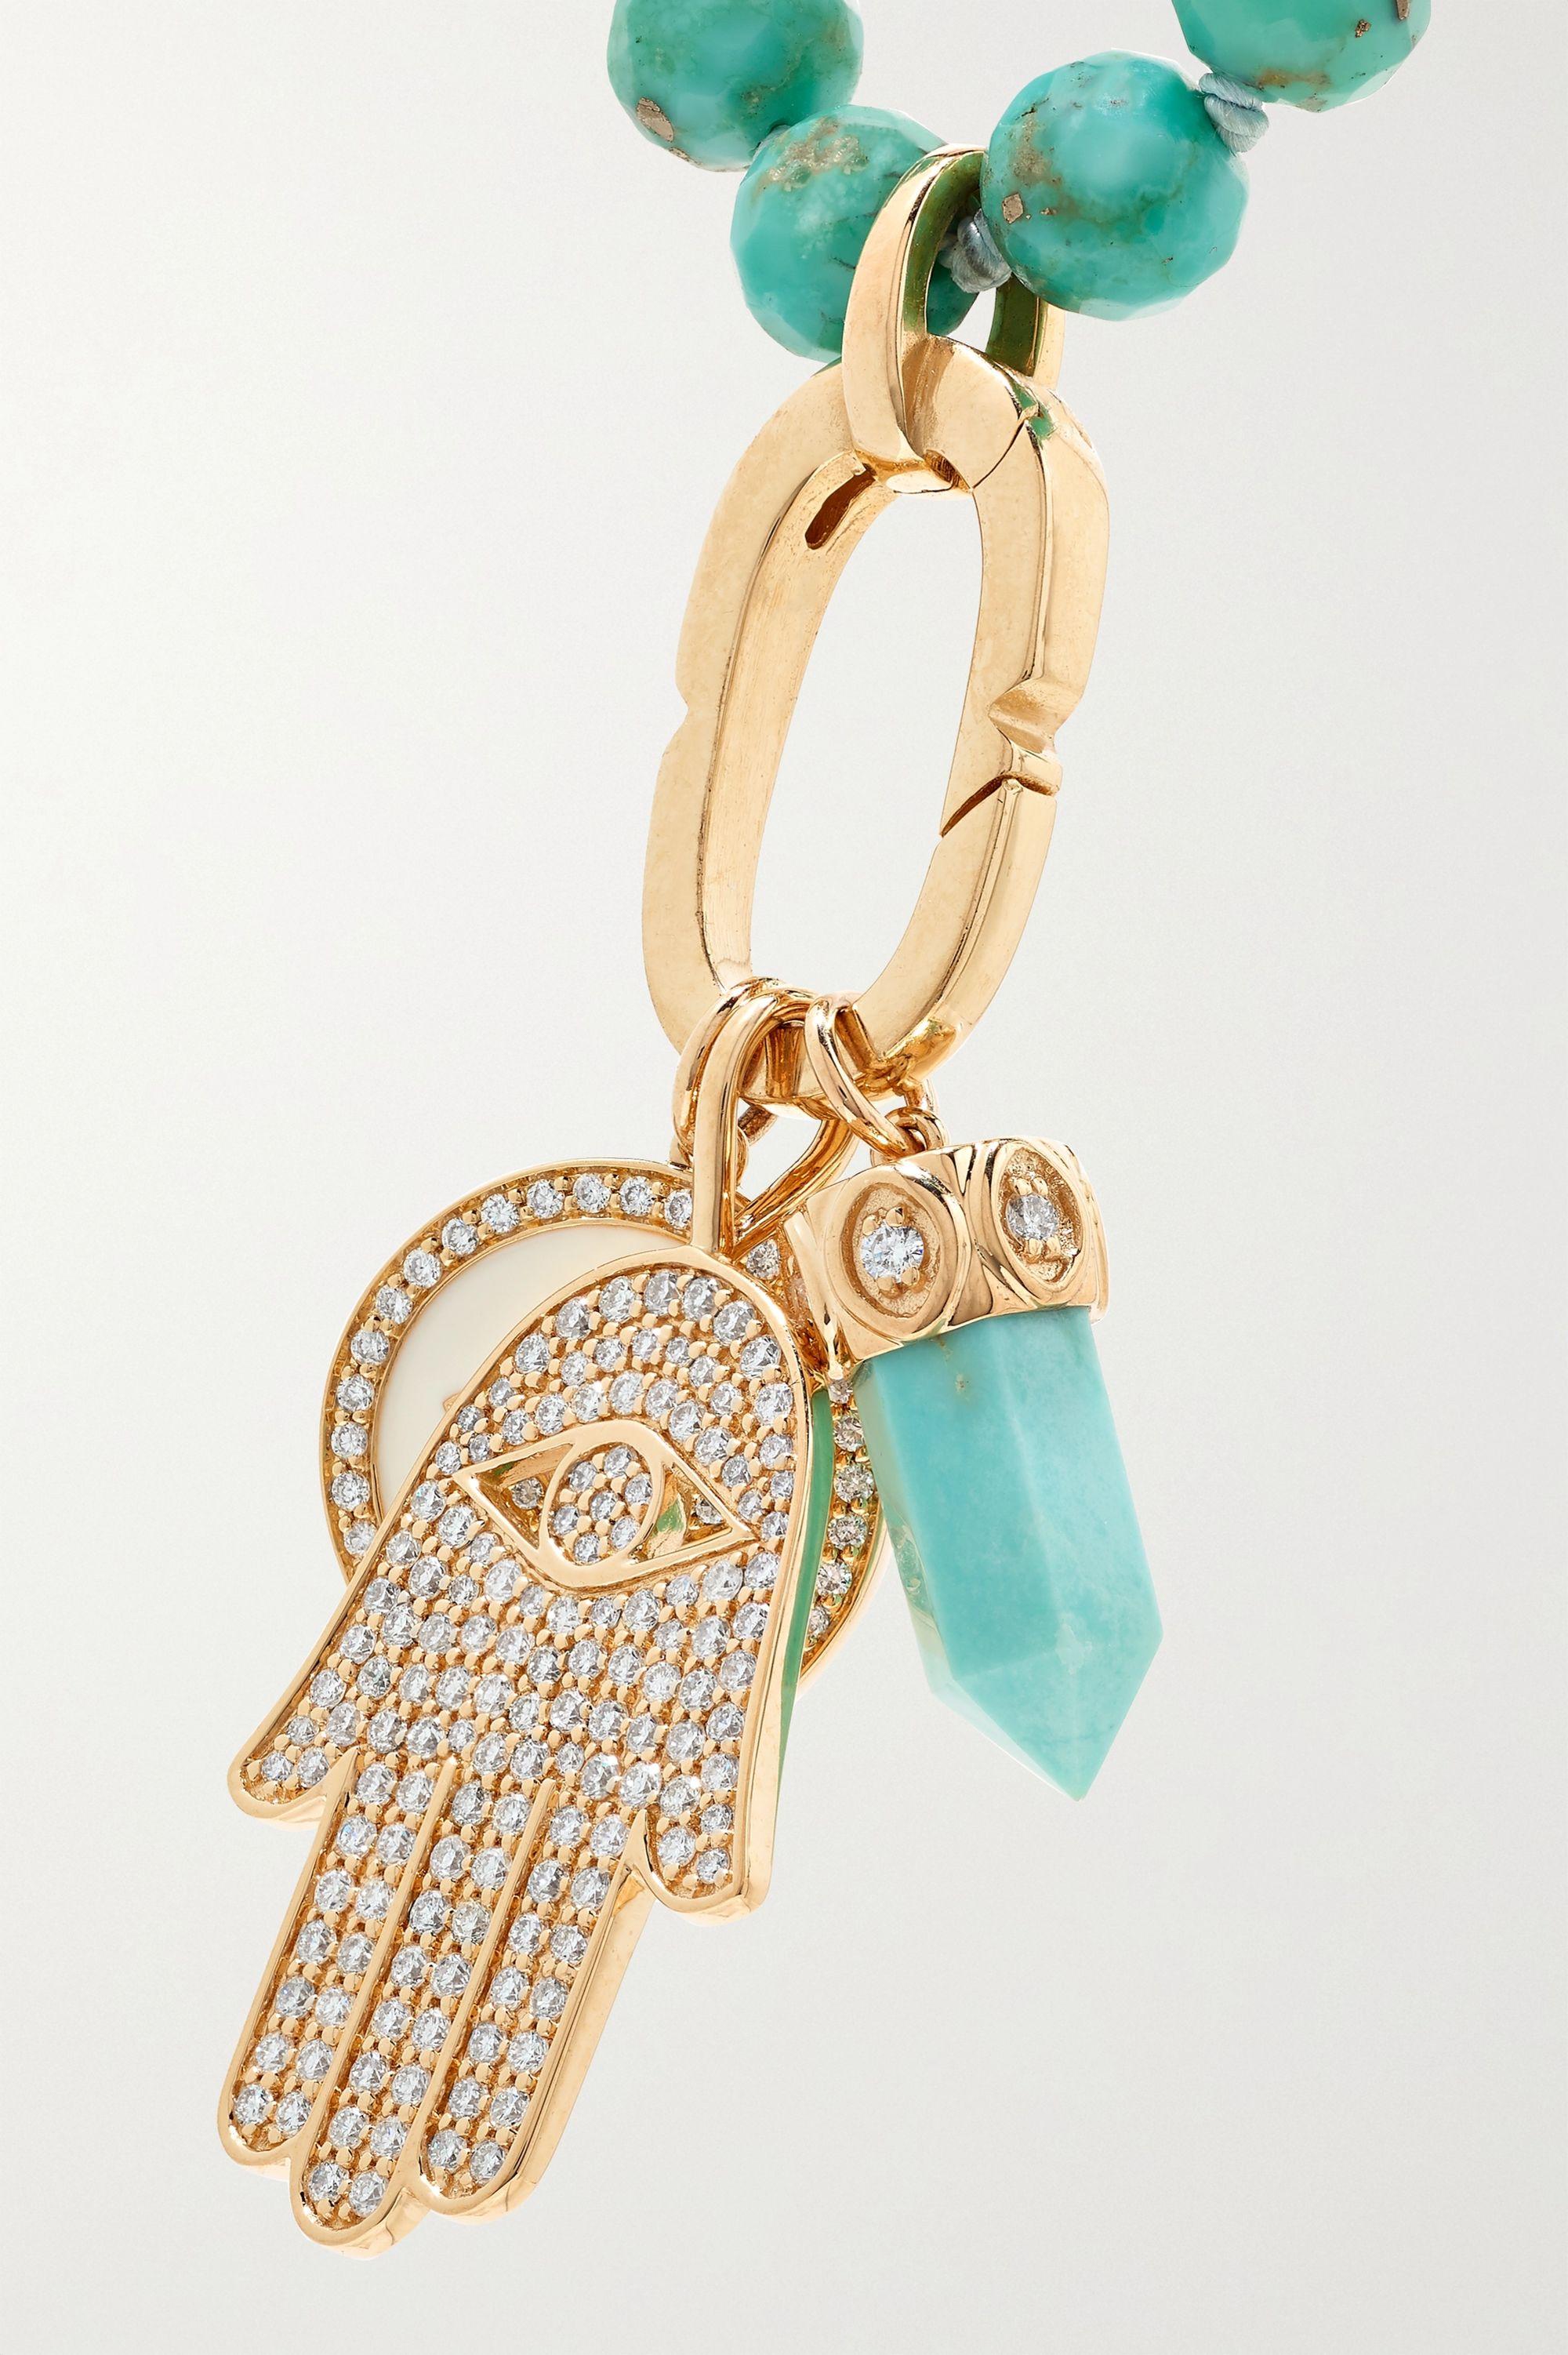 Sydney Evan 14-karat gold, turquoise and diamond necklace